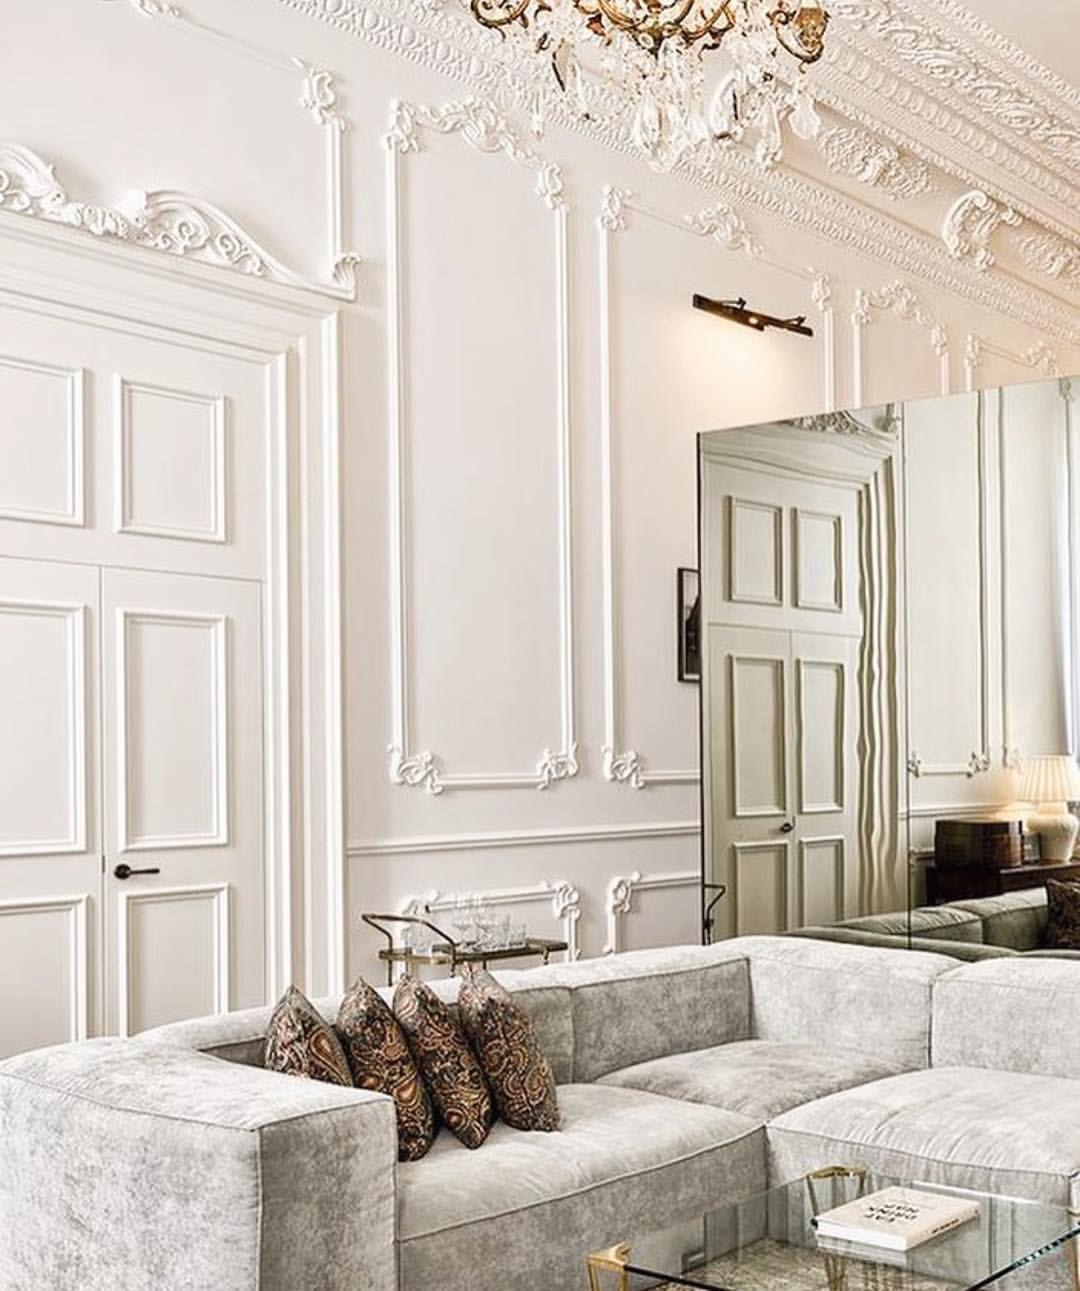 Untilmars home pinterest interiors